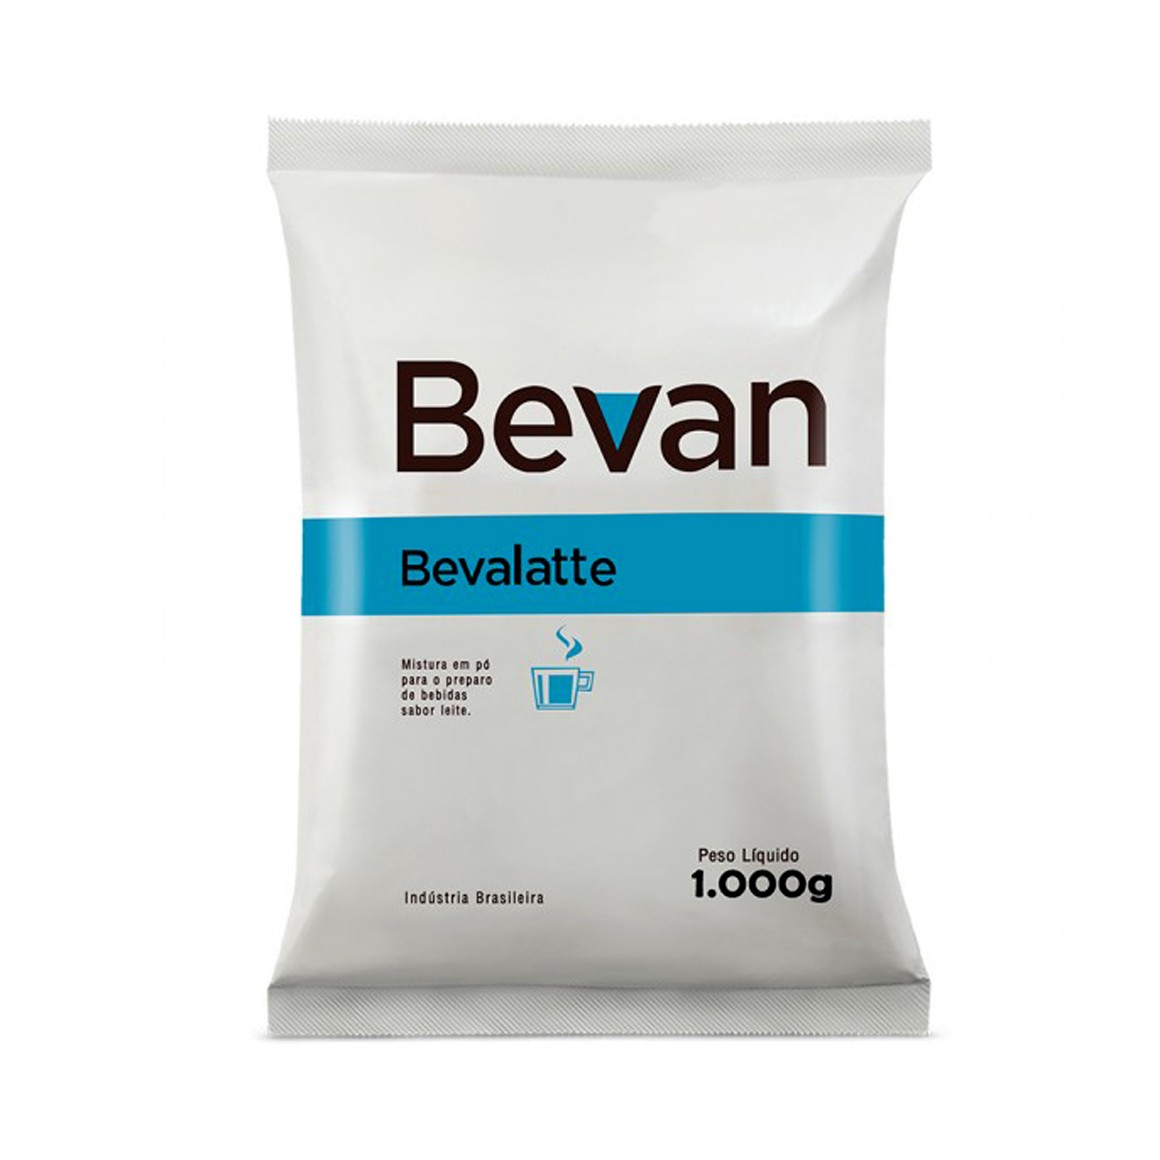 Leite em Pó Solúvel Integral Bevan Bevalatte 1 Kilo